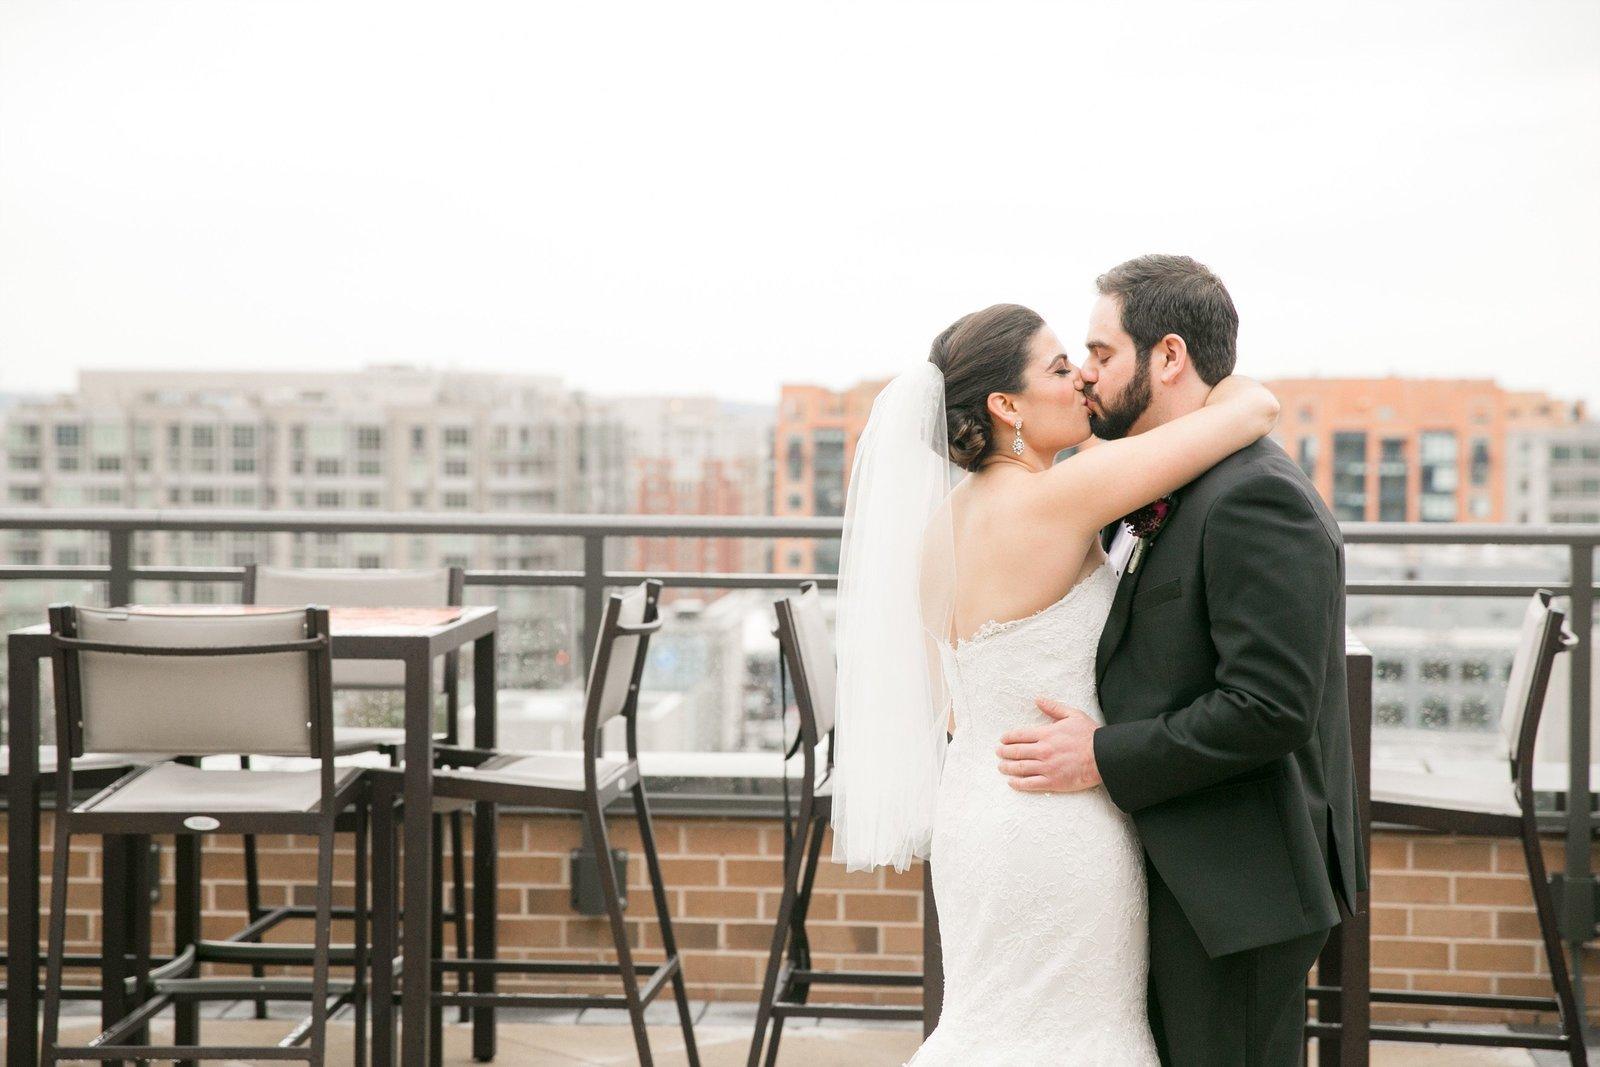 Black-tie-wedding-photos-longview-gallery-dc (134)